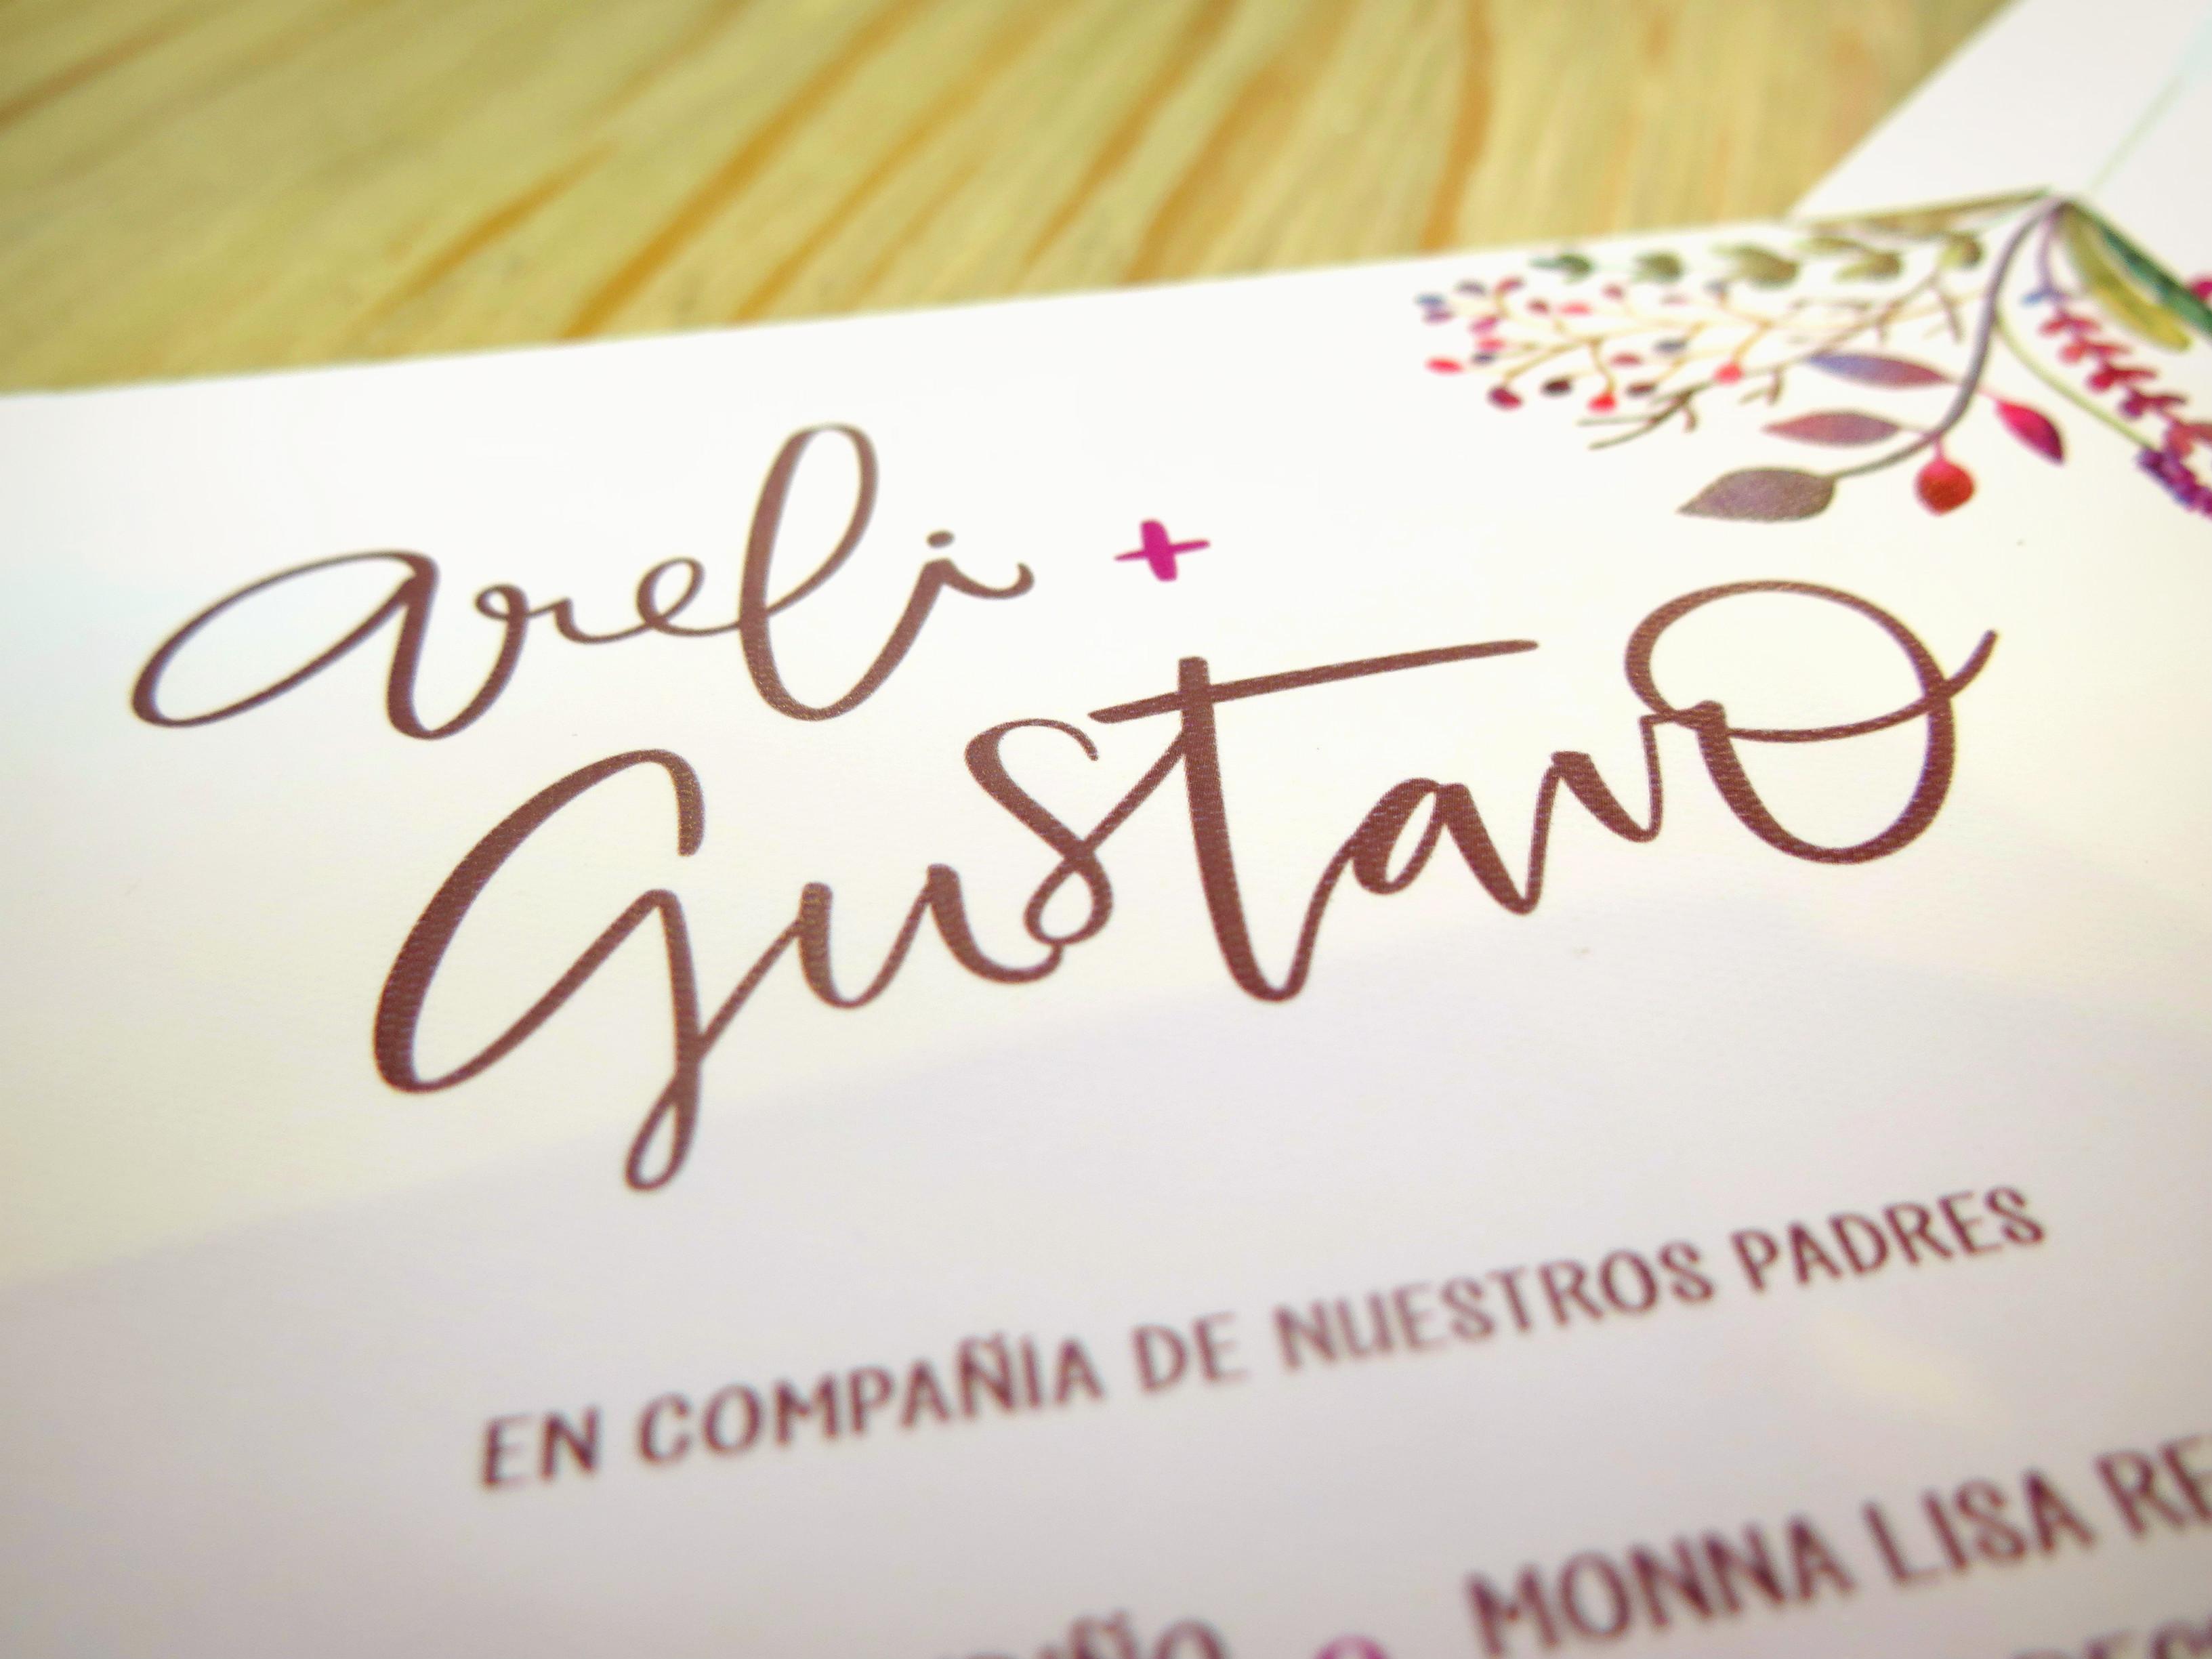 Areli+Gustavo